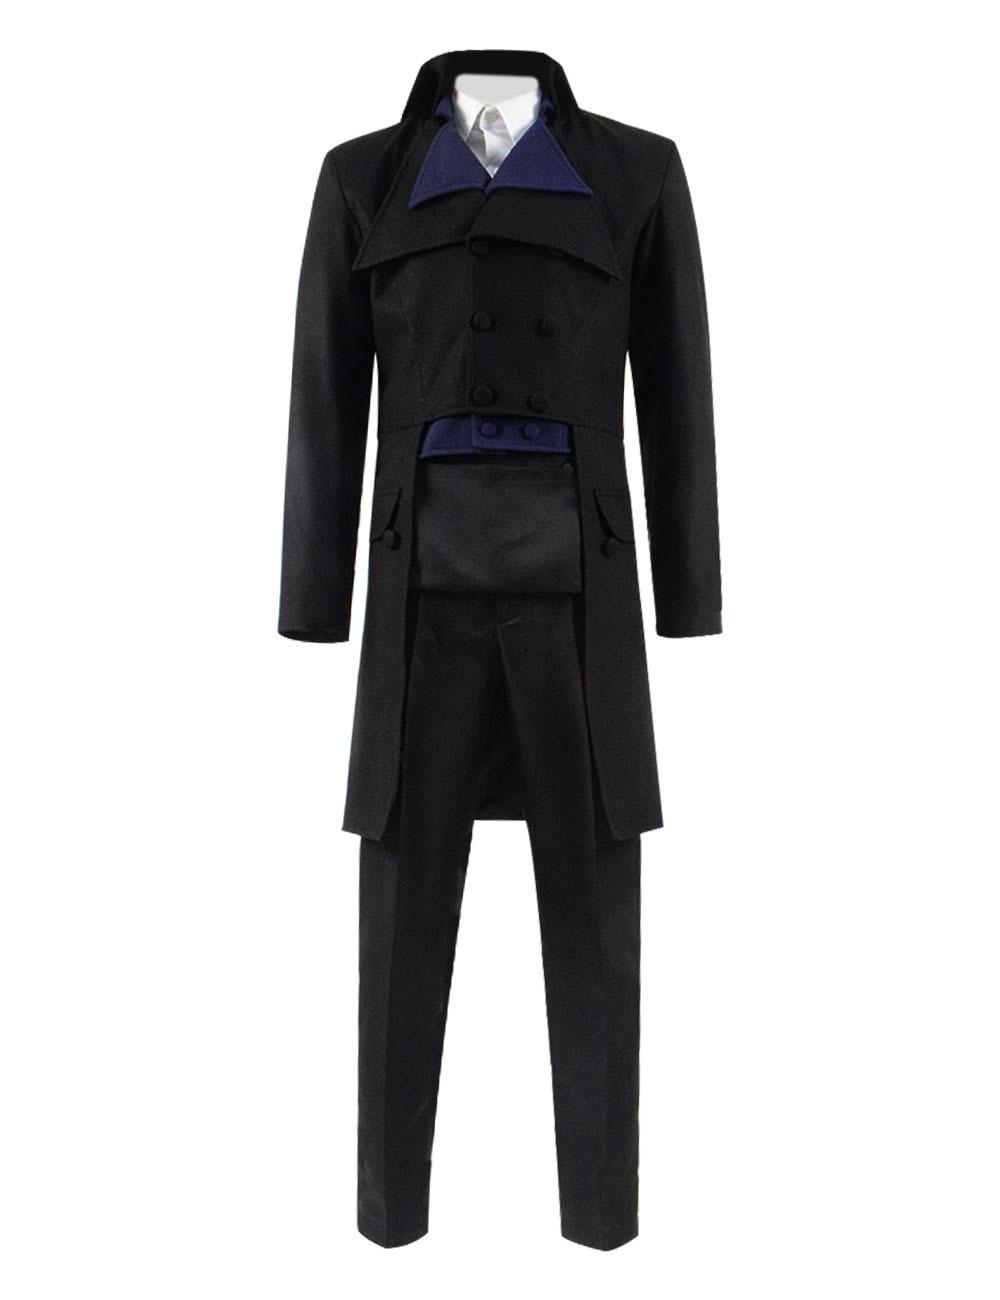 Poldark Cosplay Costume Ross Poldark Suit Jacket Tuxedo Full Set Men's Party Show Dinner Suit